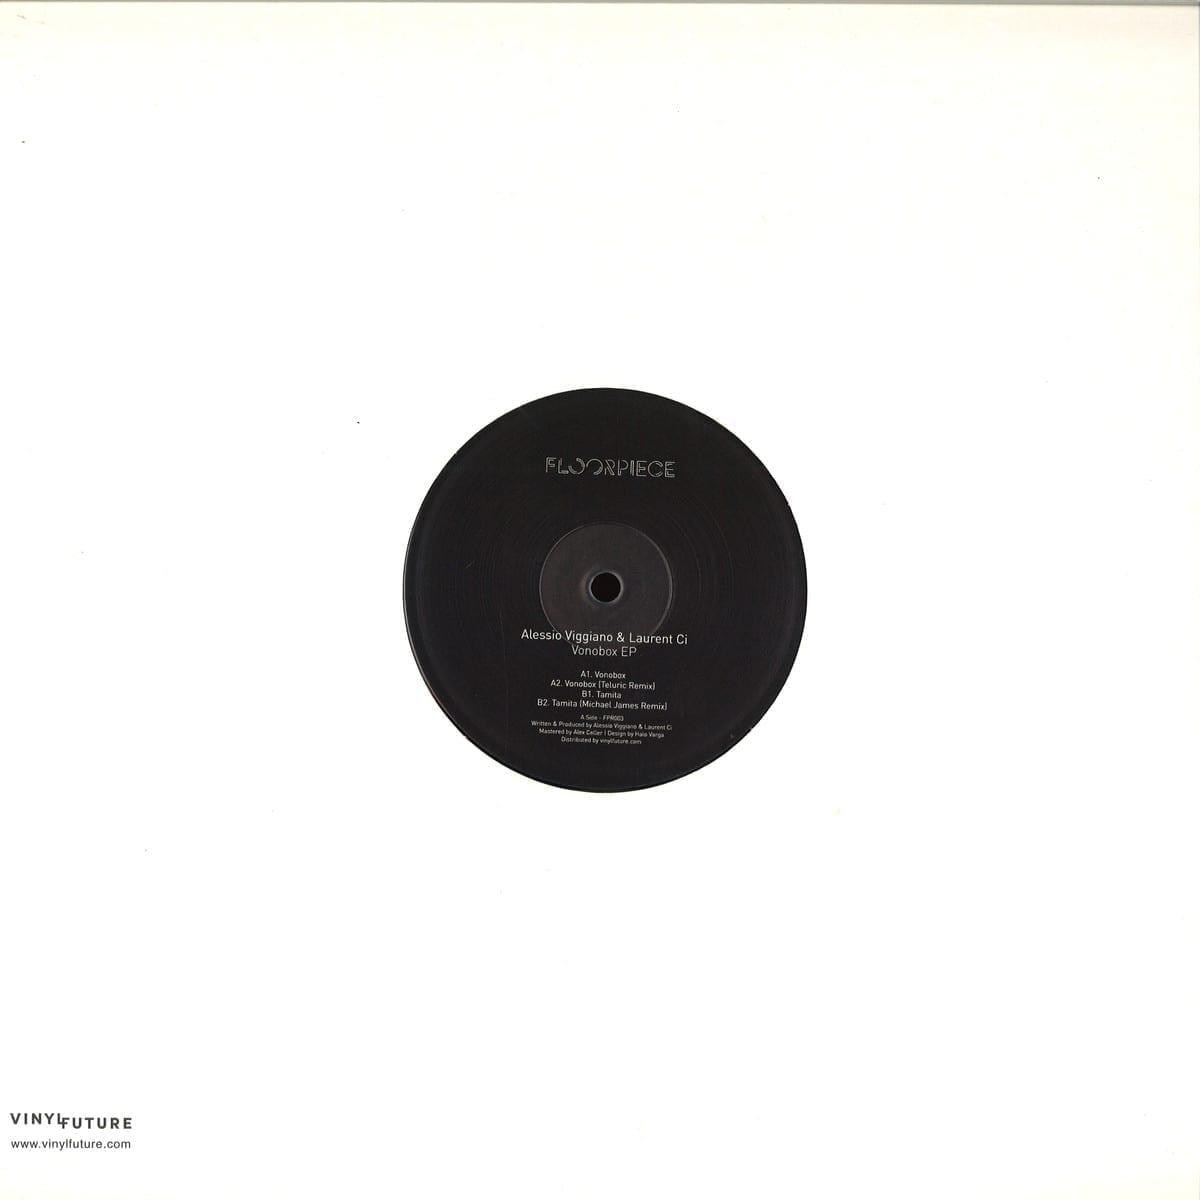 Alessio Viggiano, Laurent Ci - Vonobox EP [Floorpiece] sleeve